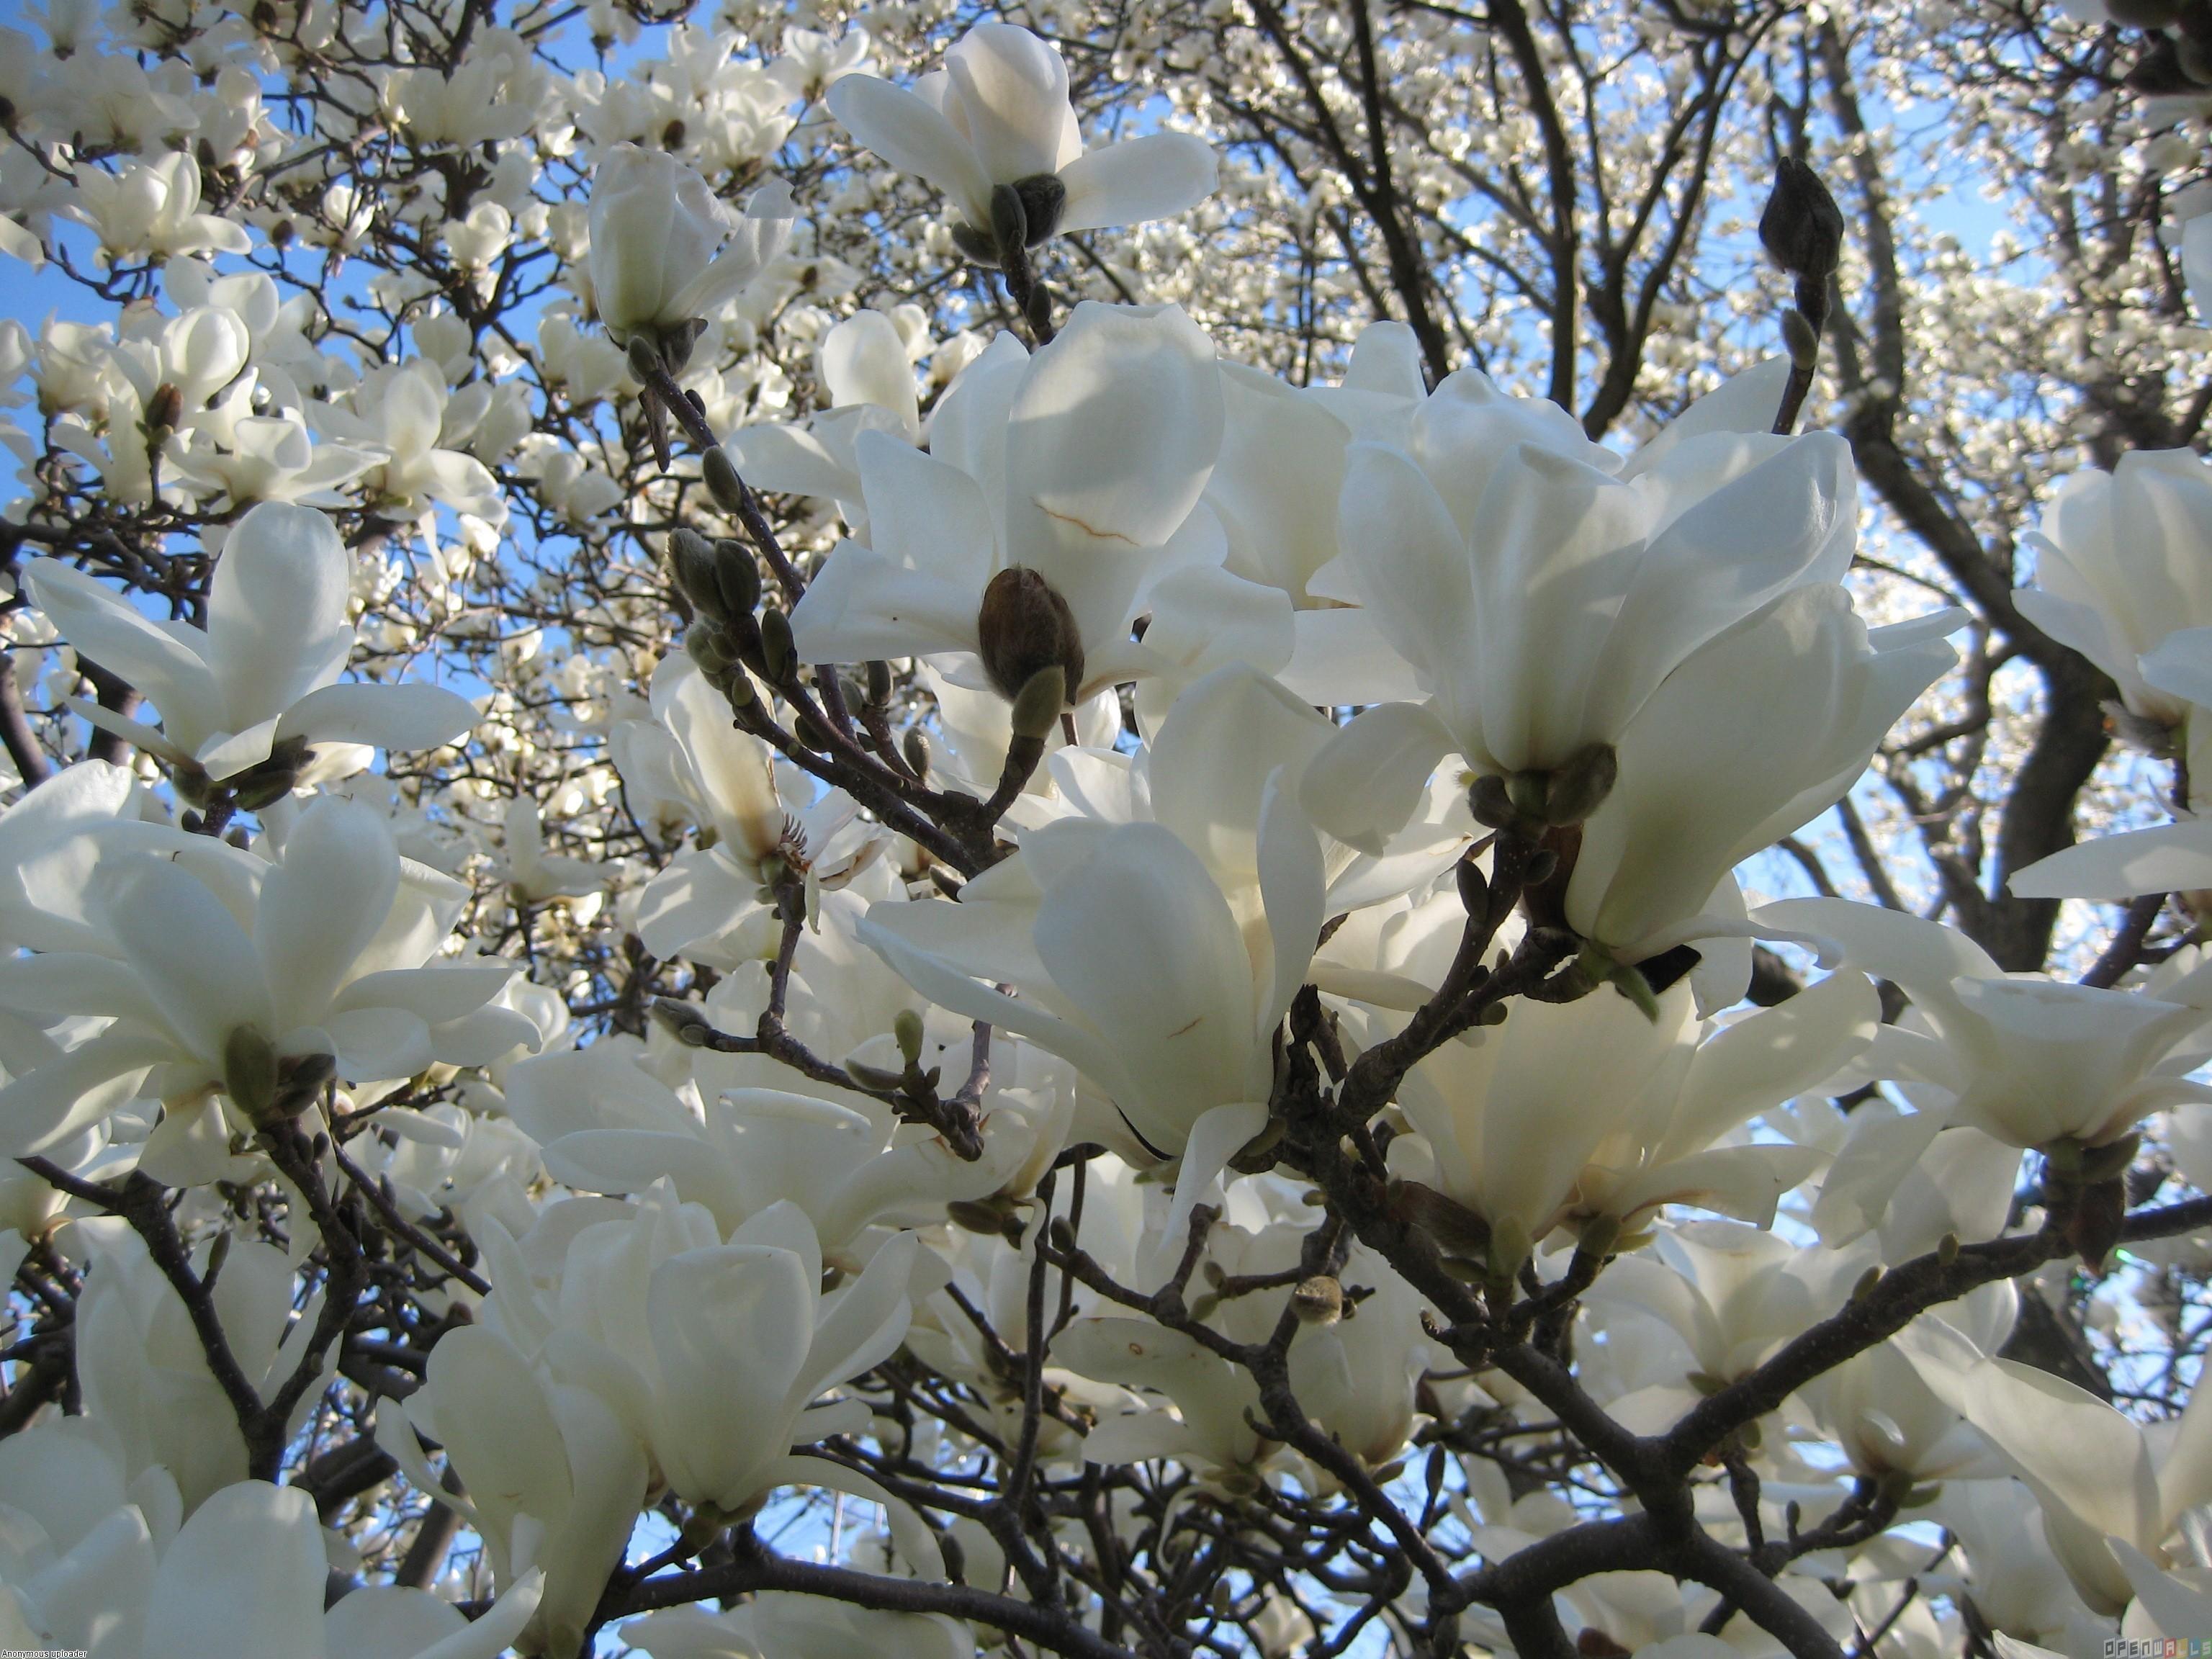 Beautiful white magnolia white wallpaper 34732661 fanpop - Magnolia background ...